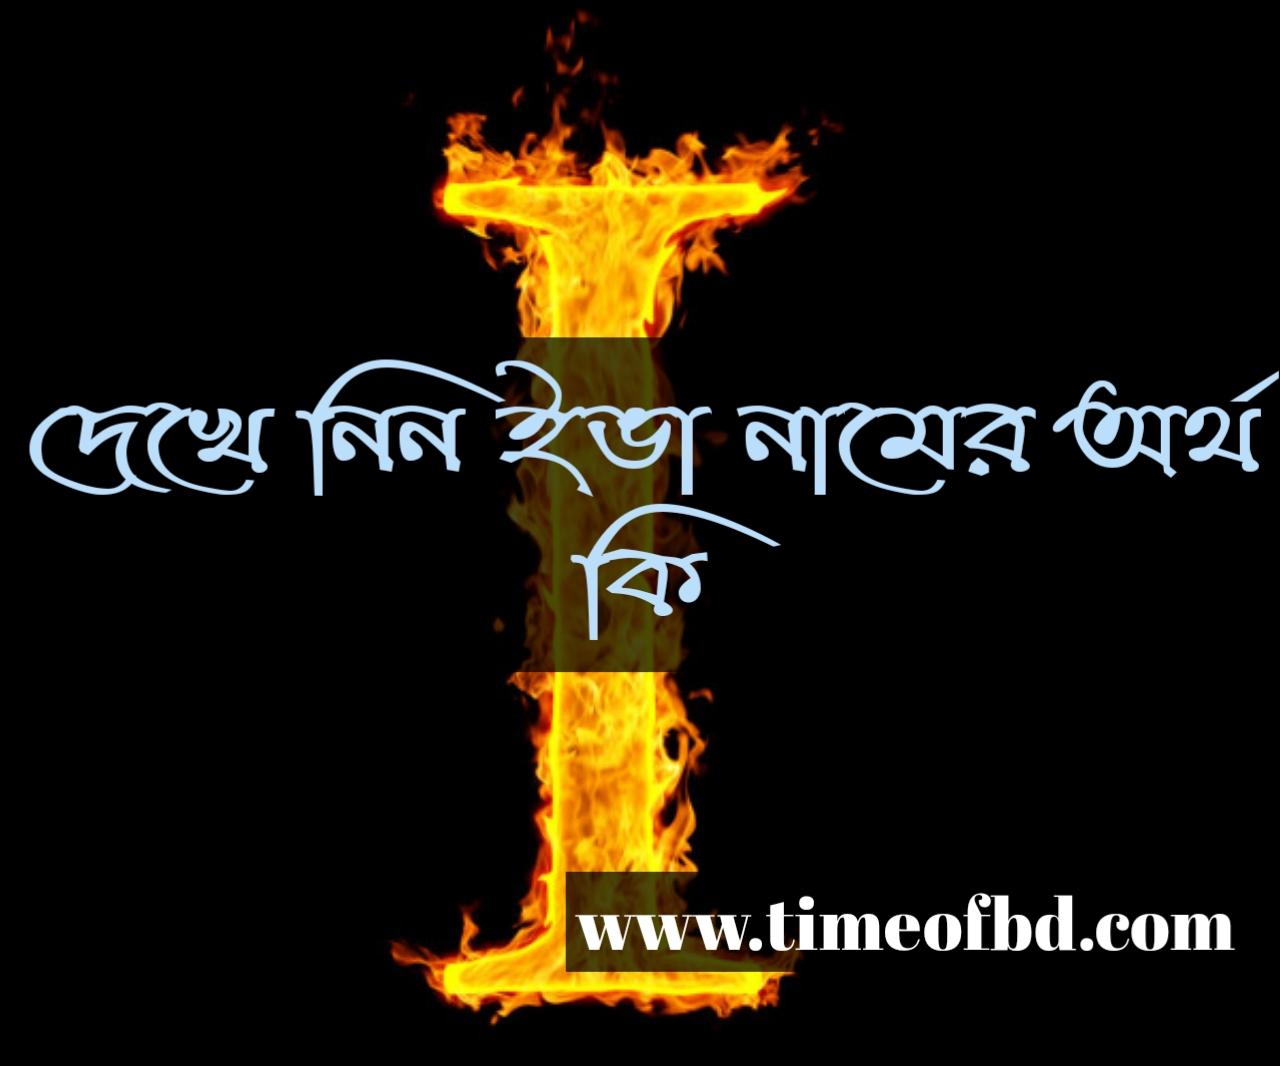 Eva name meaning in Bengali, ইভা নামের অর্থ কি, ইভা নামের বাংলা অর্থ কি, ইভা নামের ইসলামিক অর্থ কি,